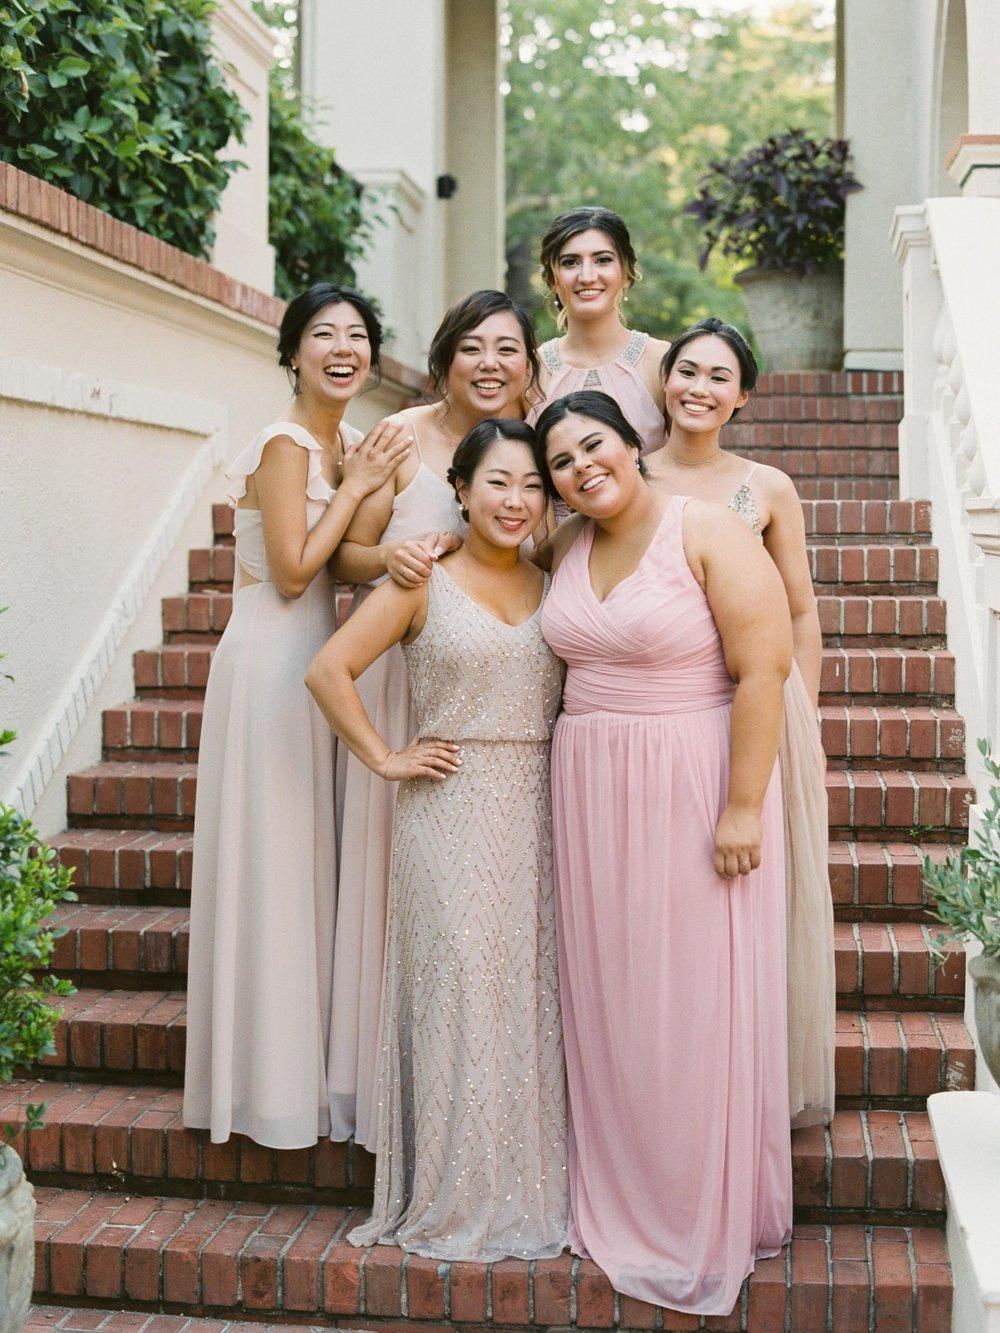 Villa_Montalvo_Wedding_Photographer_Videographer_San_Francisco114.jpg